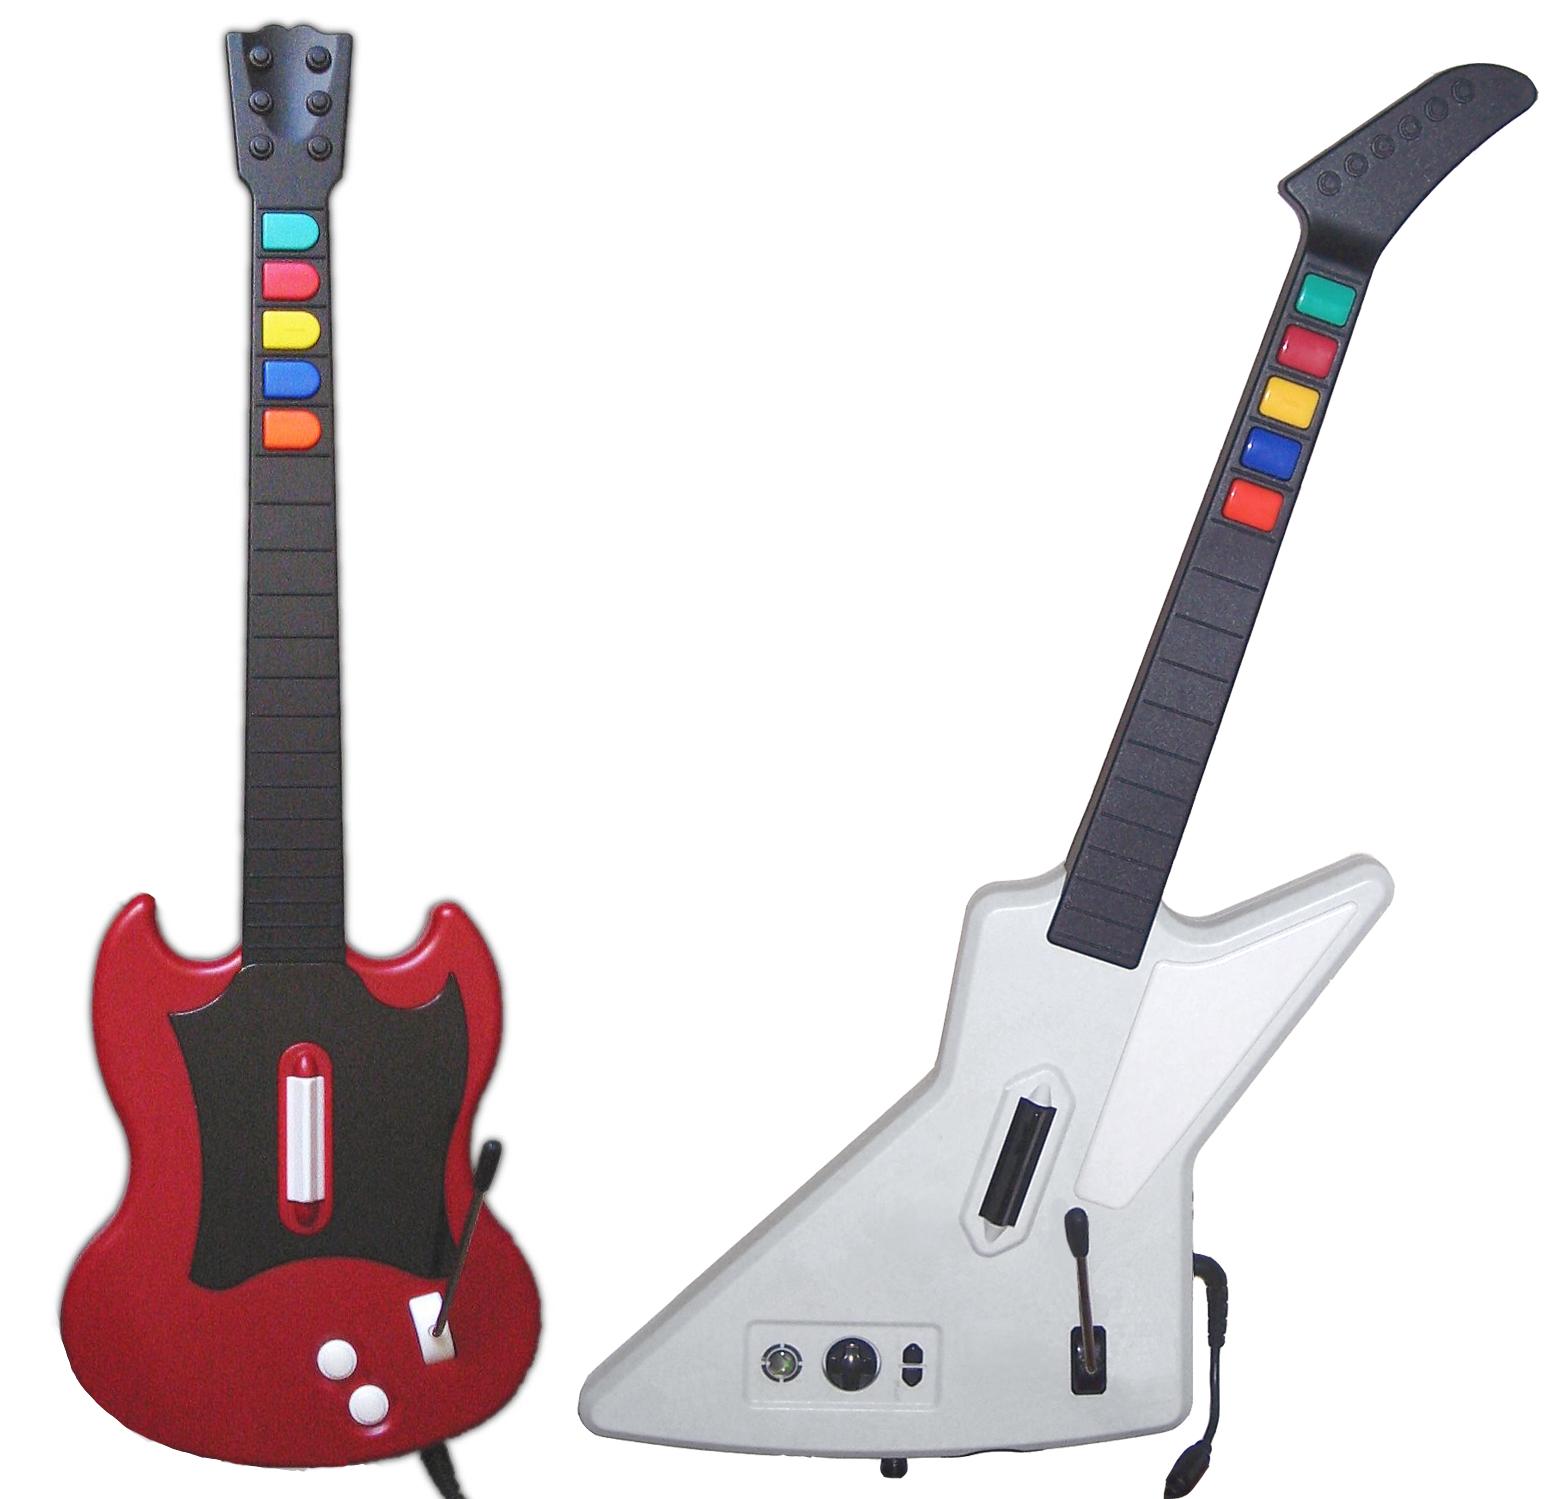 Guitar hero picture 75